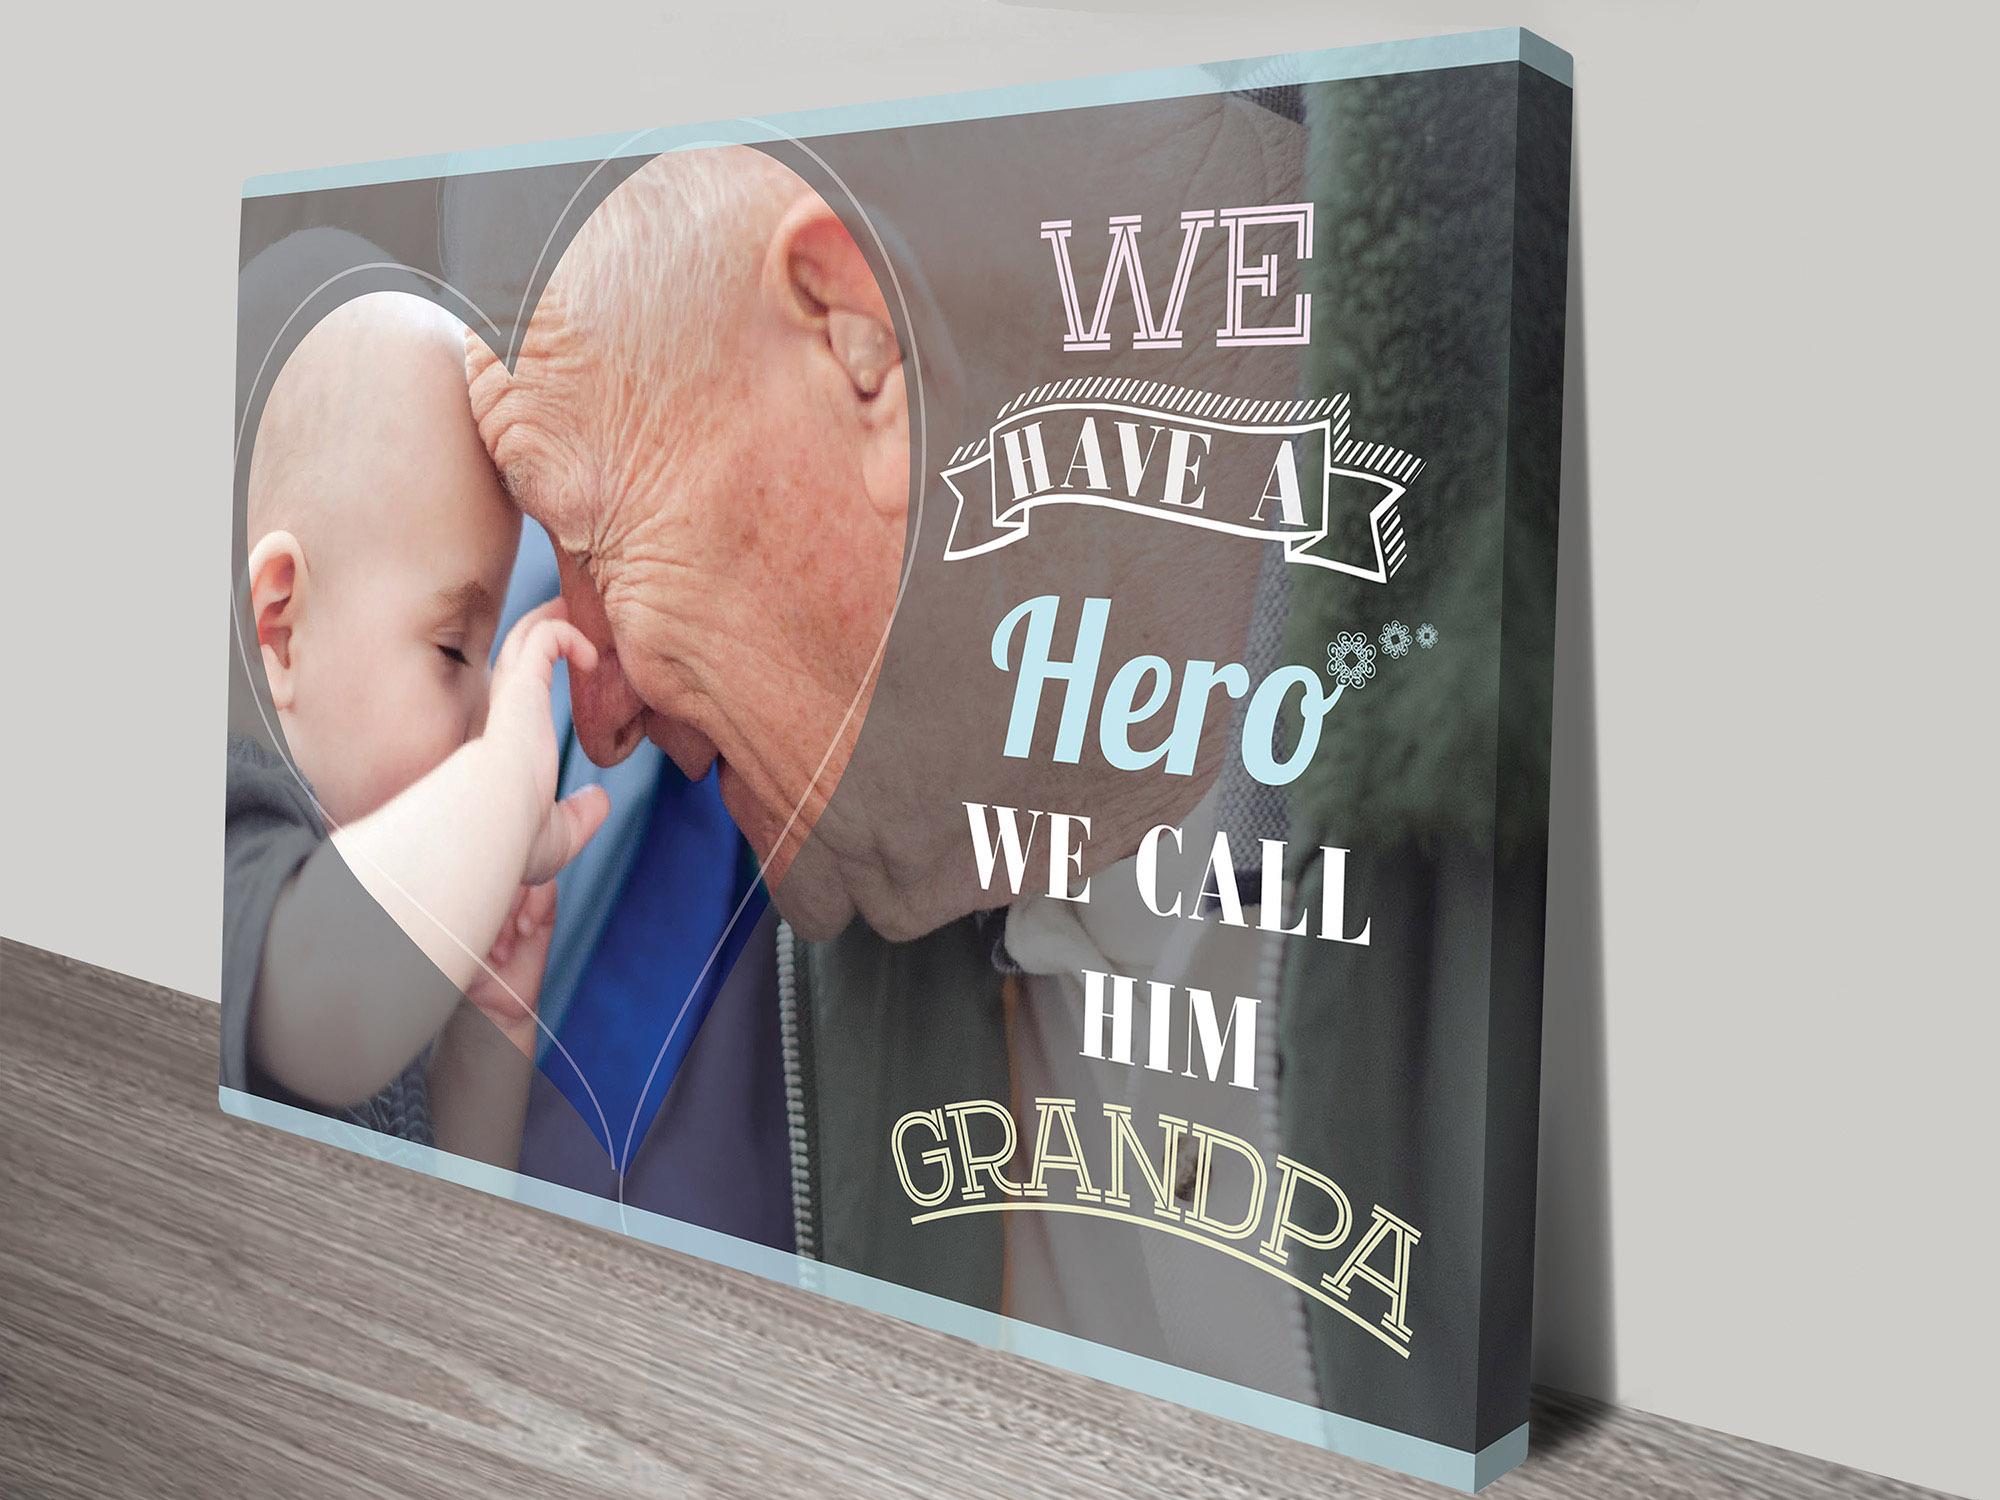 grandad personalised gift idea | Our Hero